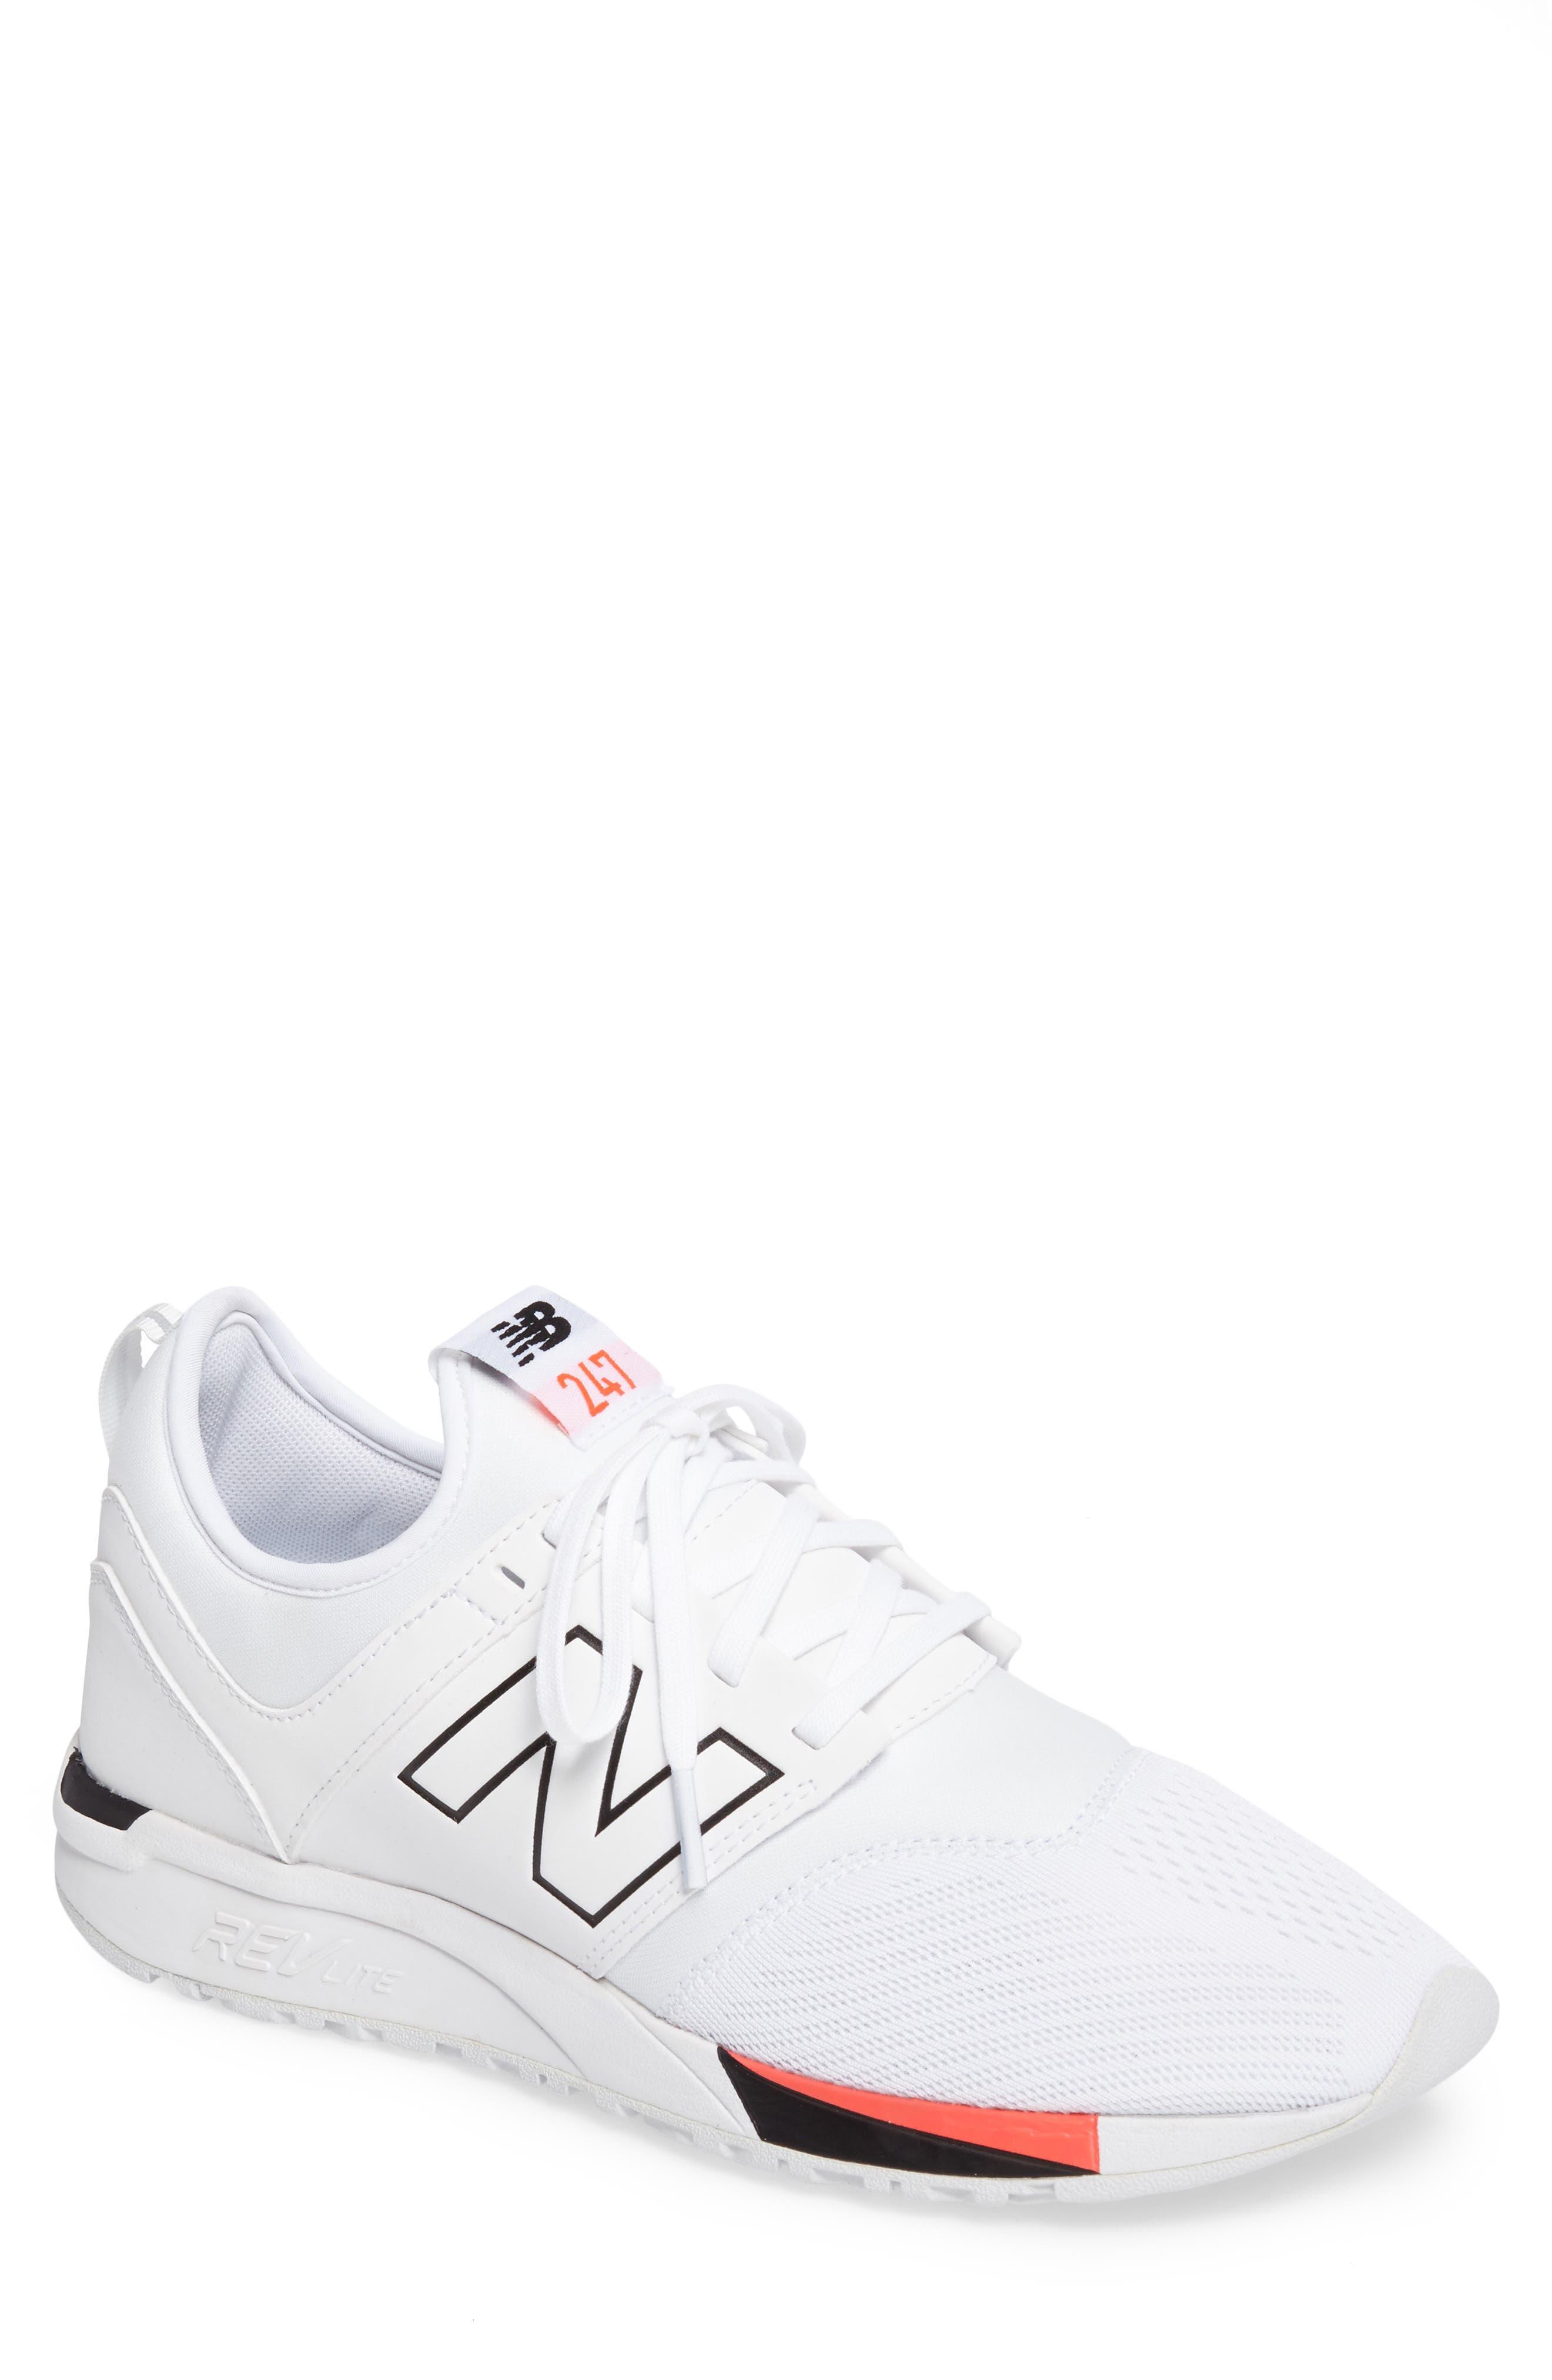 247 Classic Plus Sneaker,                             Main thumbnail 1, color,